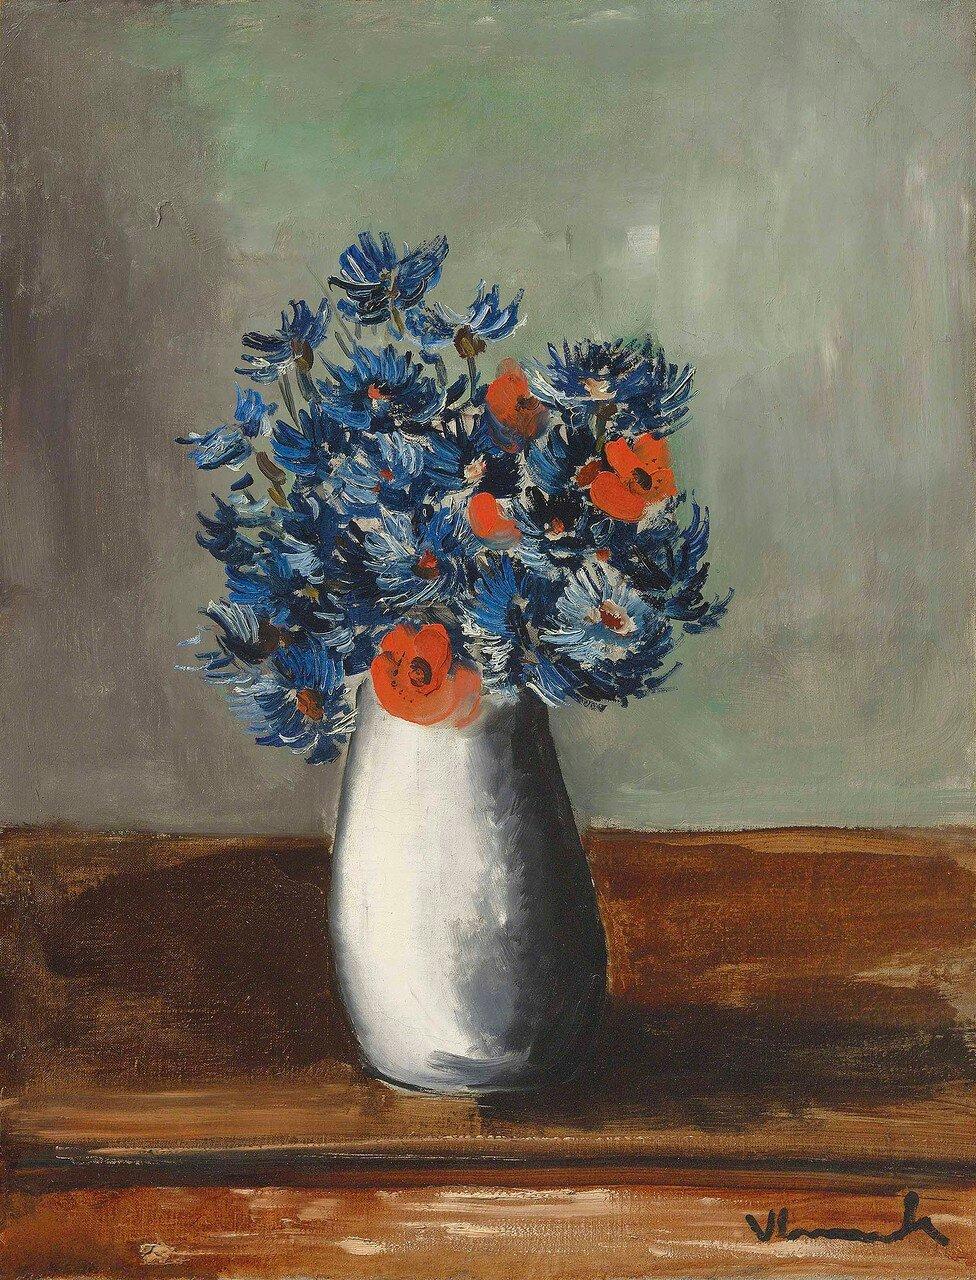 2018_CKS_15472_0585_000(maurice_de_vlaminck_bouquet_de_marguerites).jpg